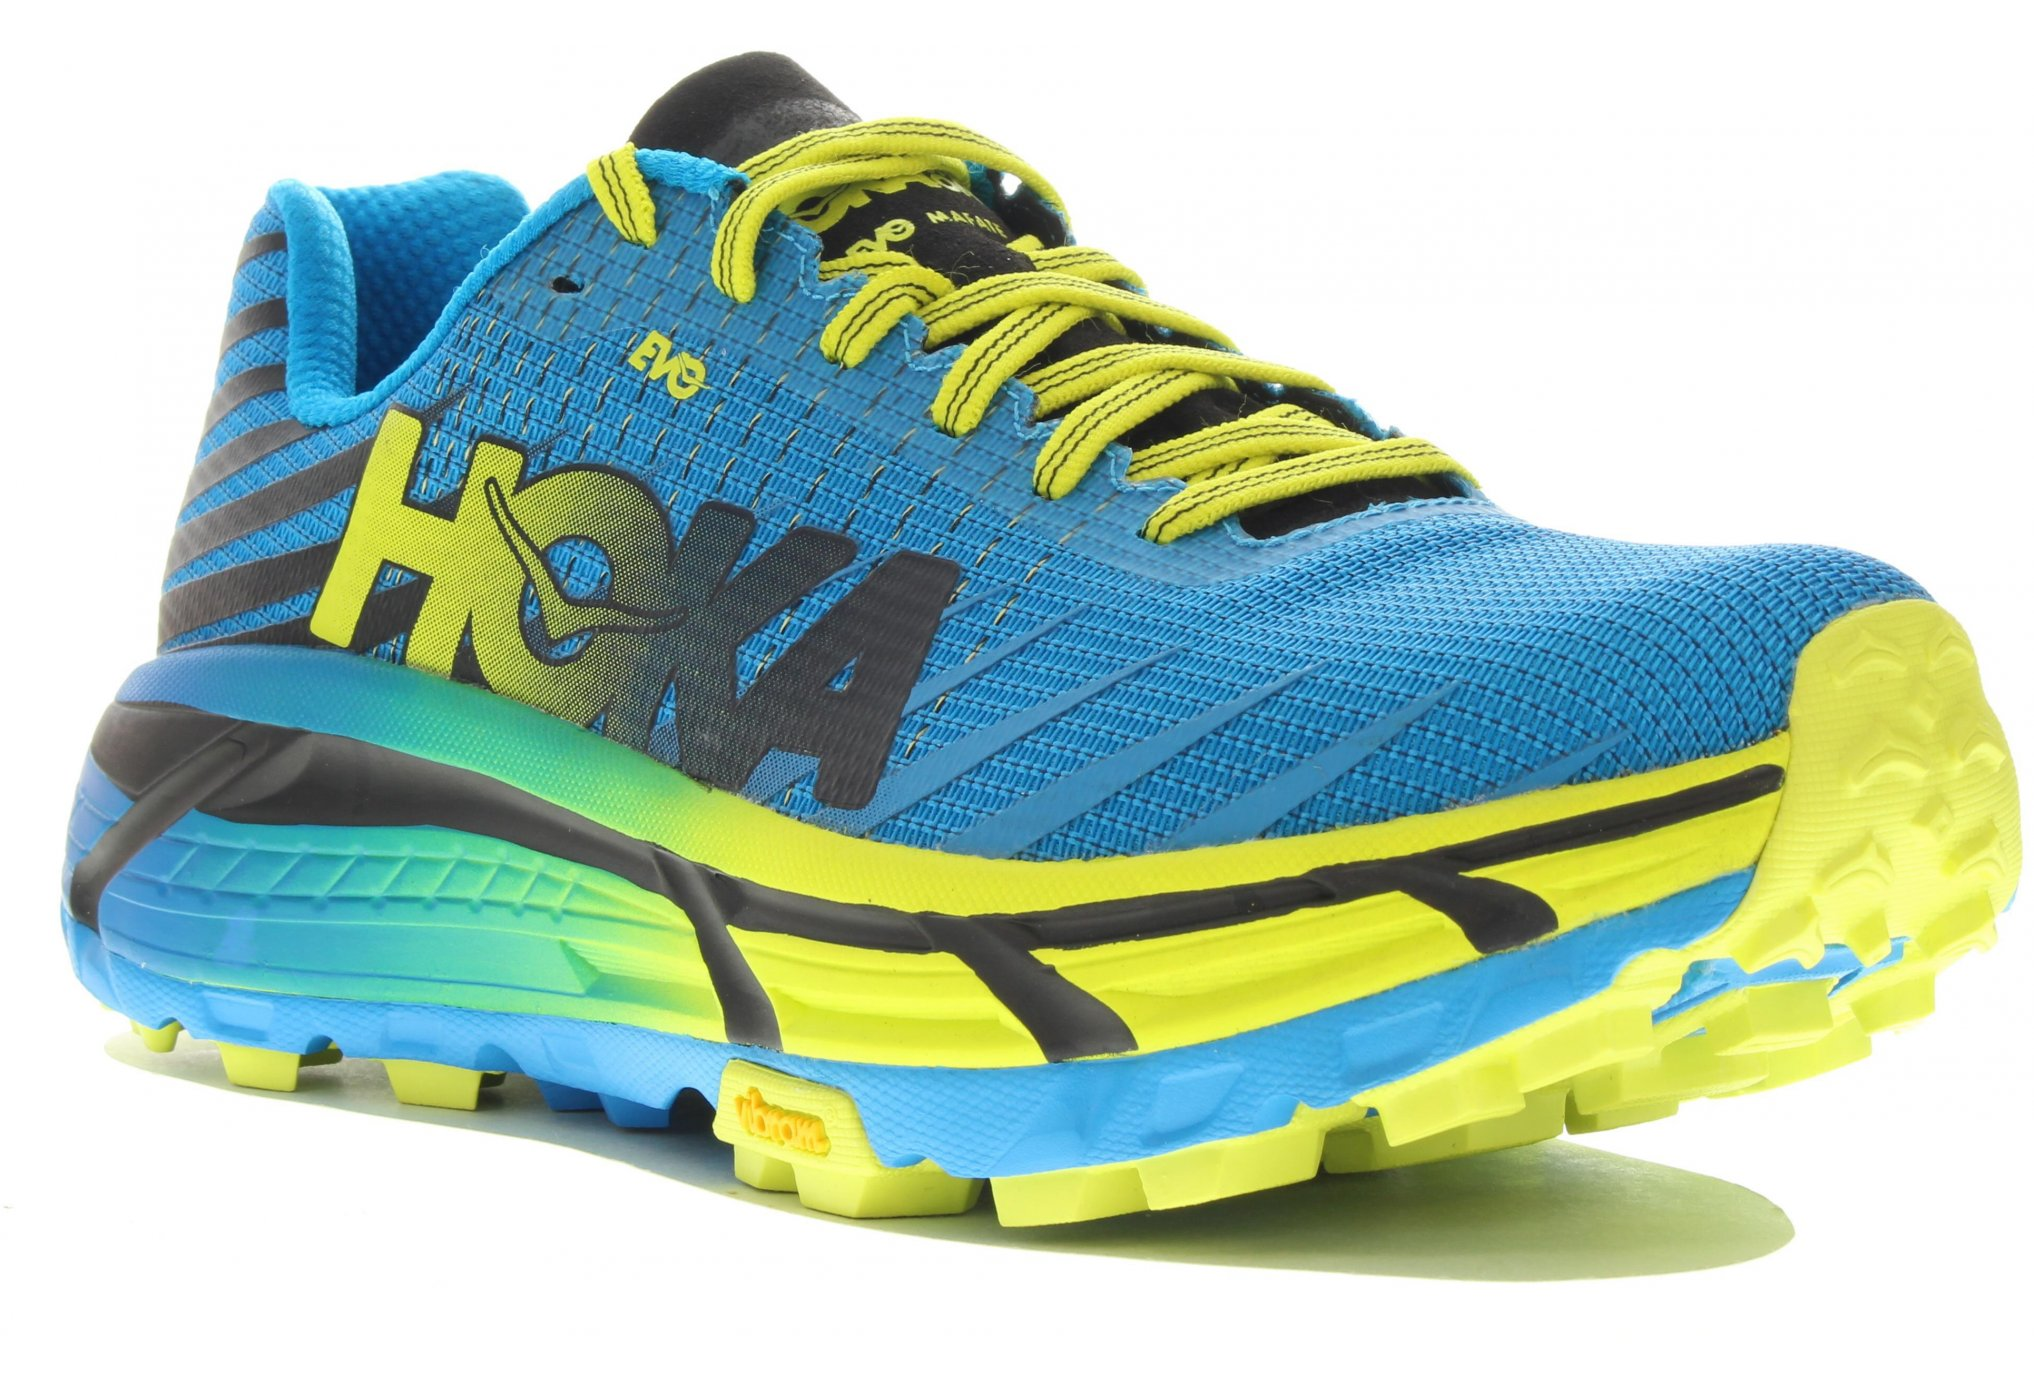 Hoka One One Evo Mafate Chaussures running femme